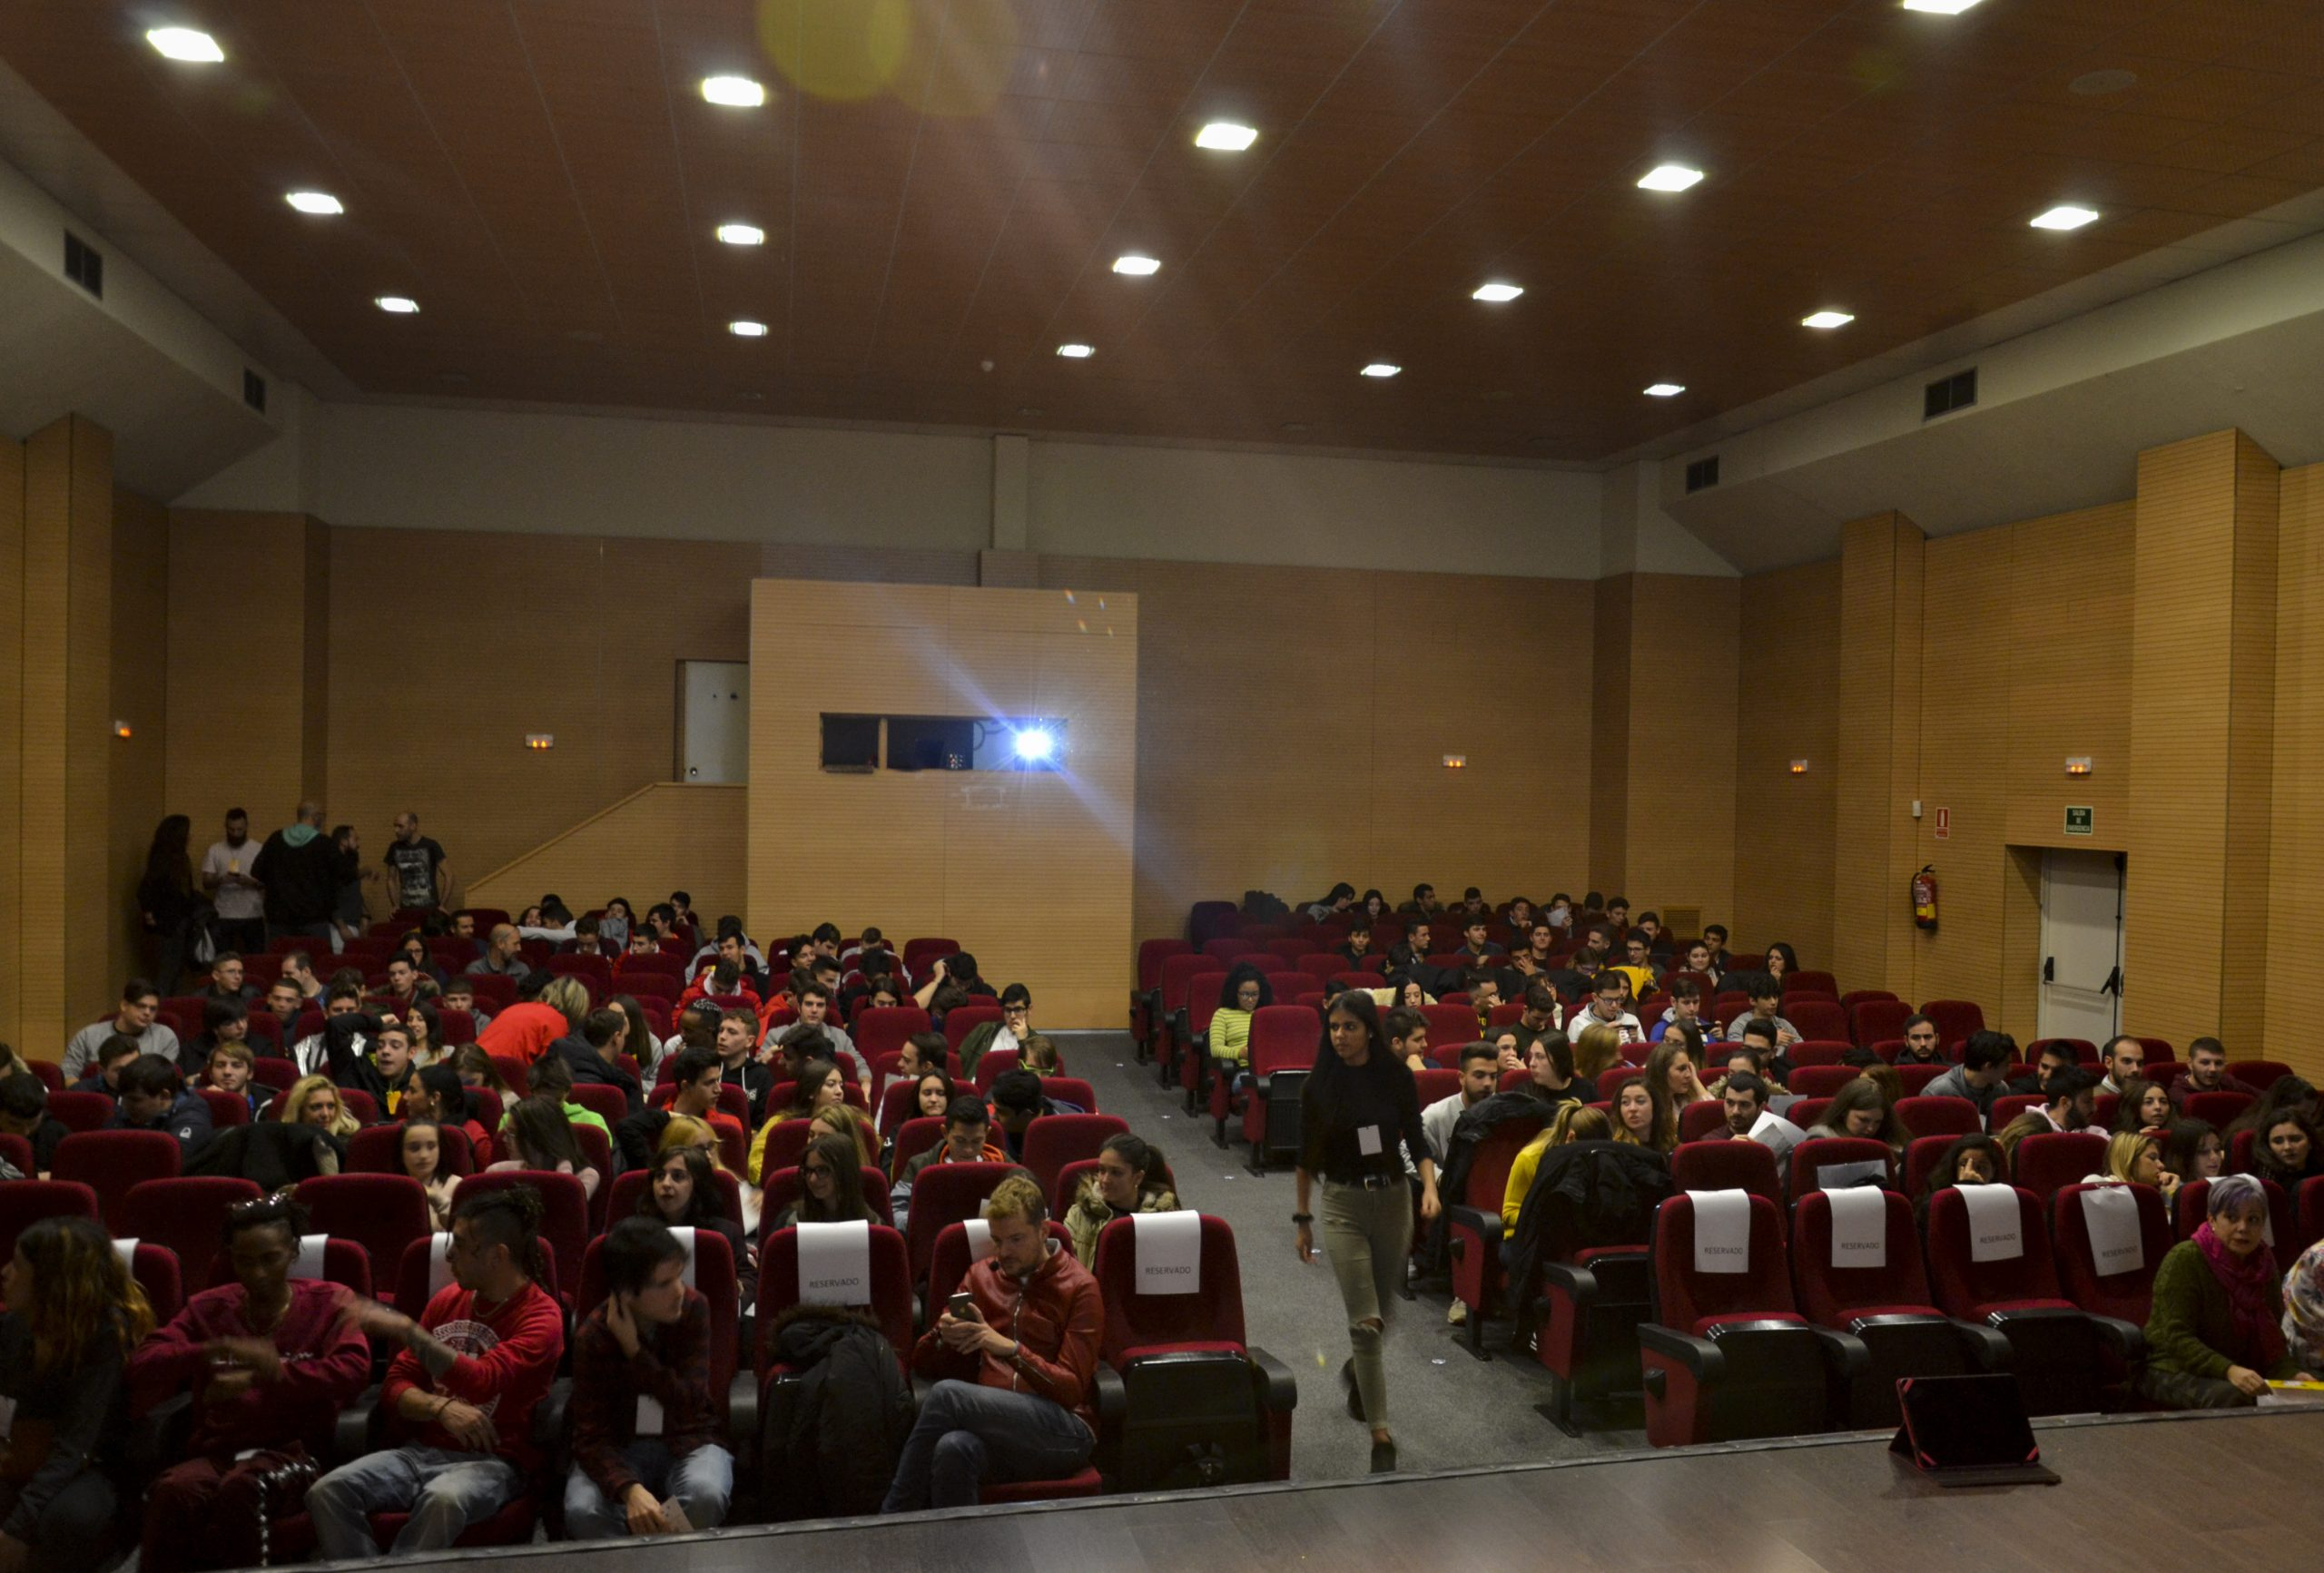 Jornadas-Mejorada-20-12-2018-39-scaled